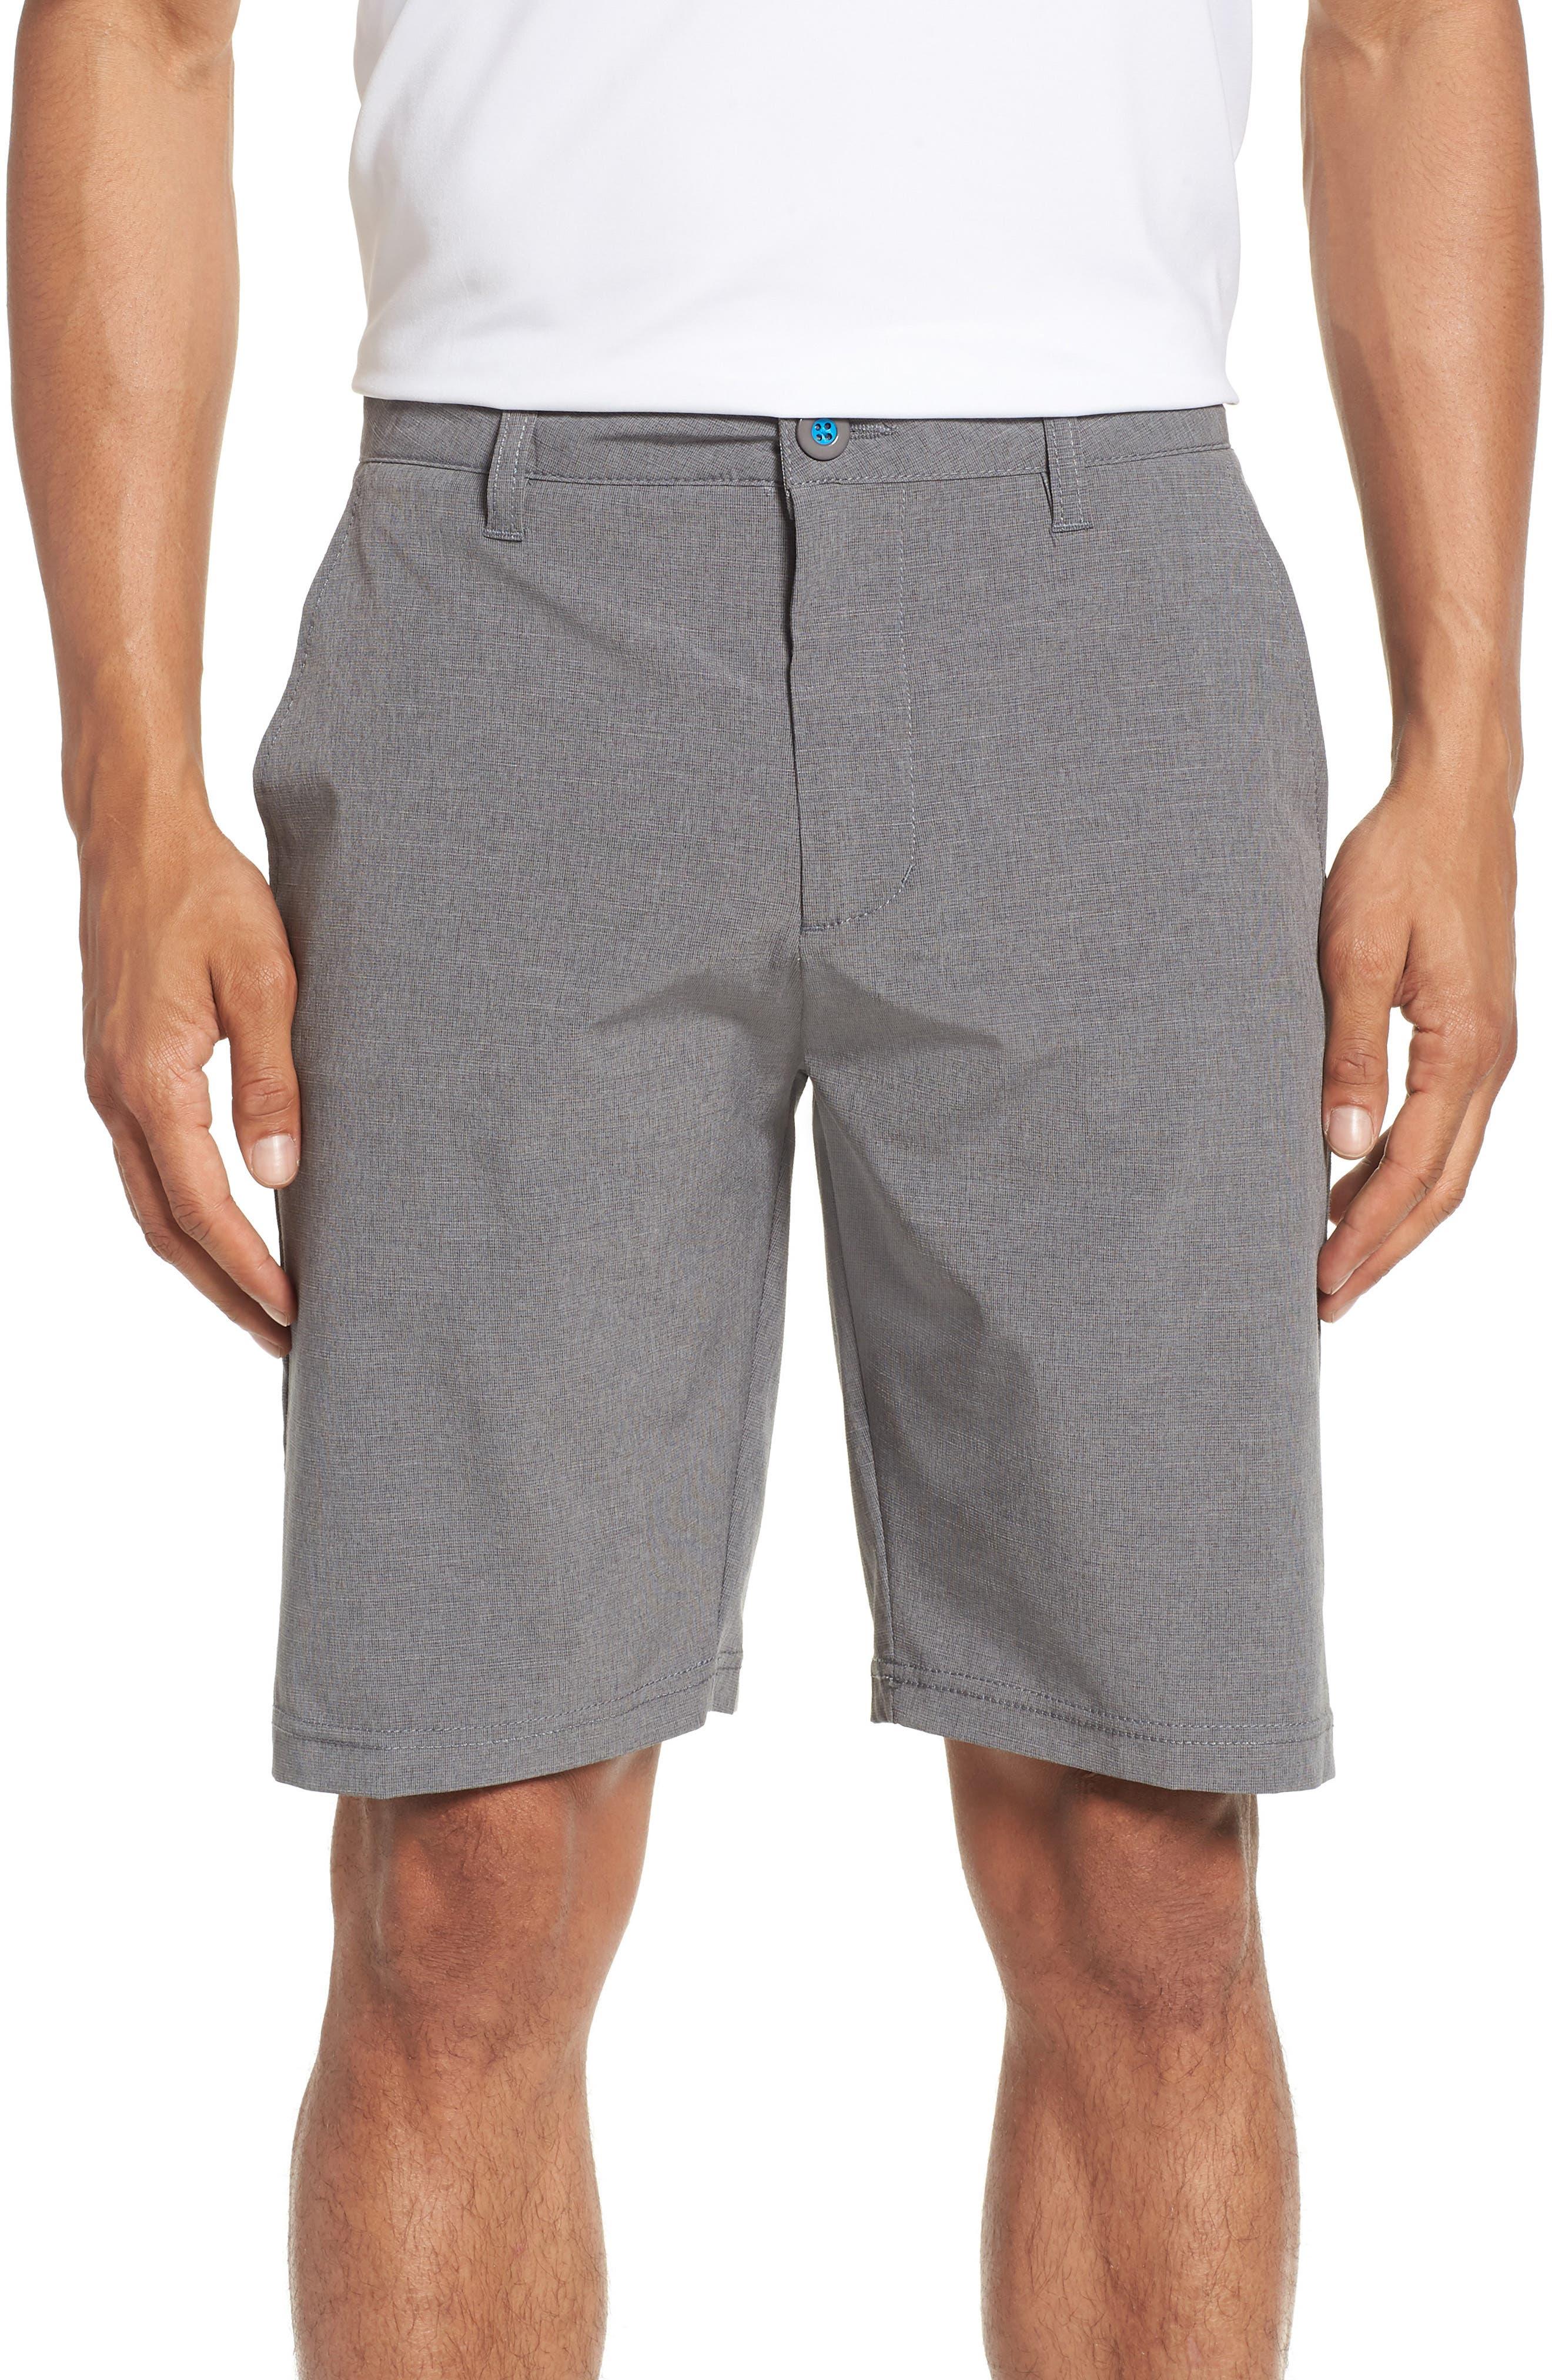 DEVEREUX Cruiser Hybrid Shorts, Main, color, CHARCOAL